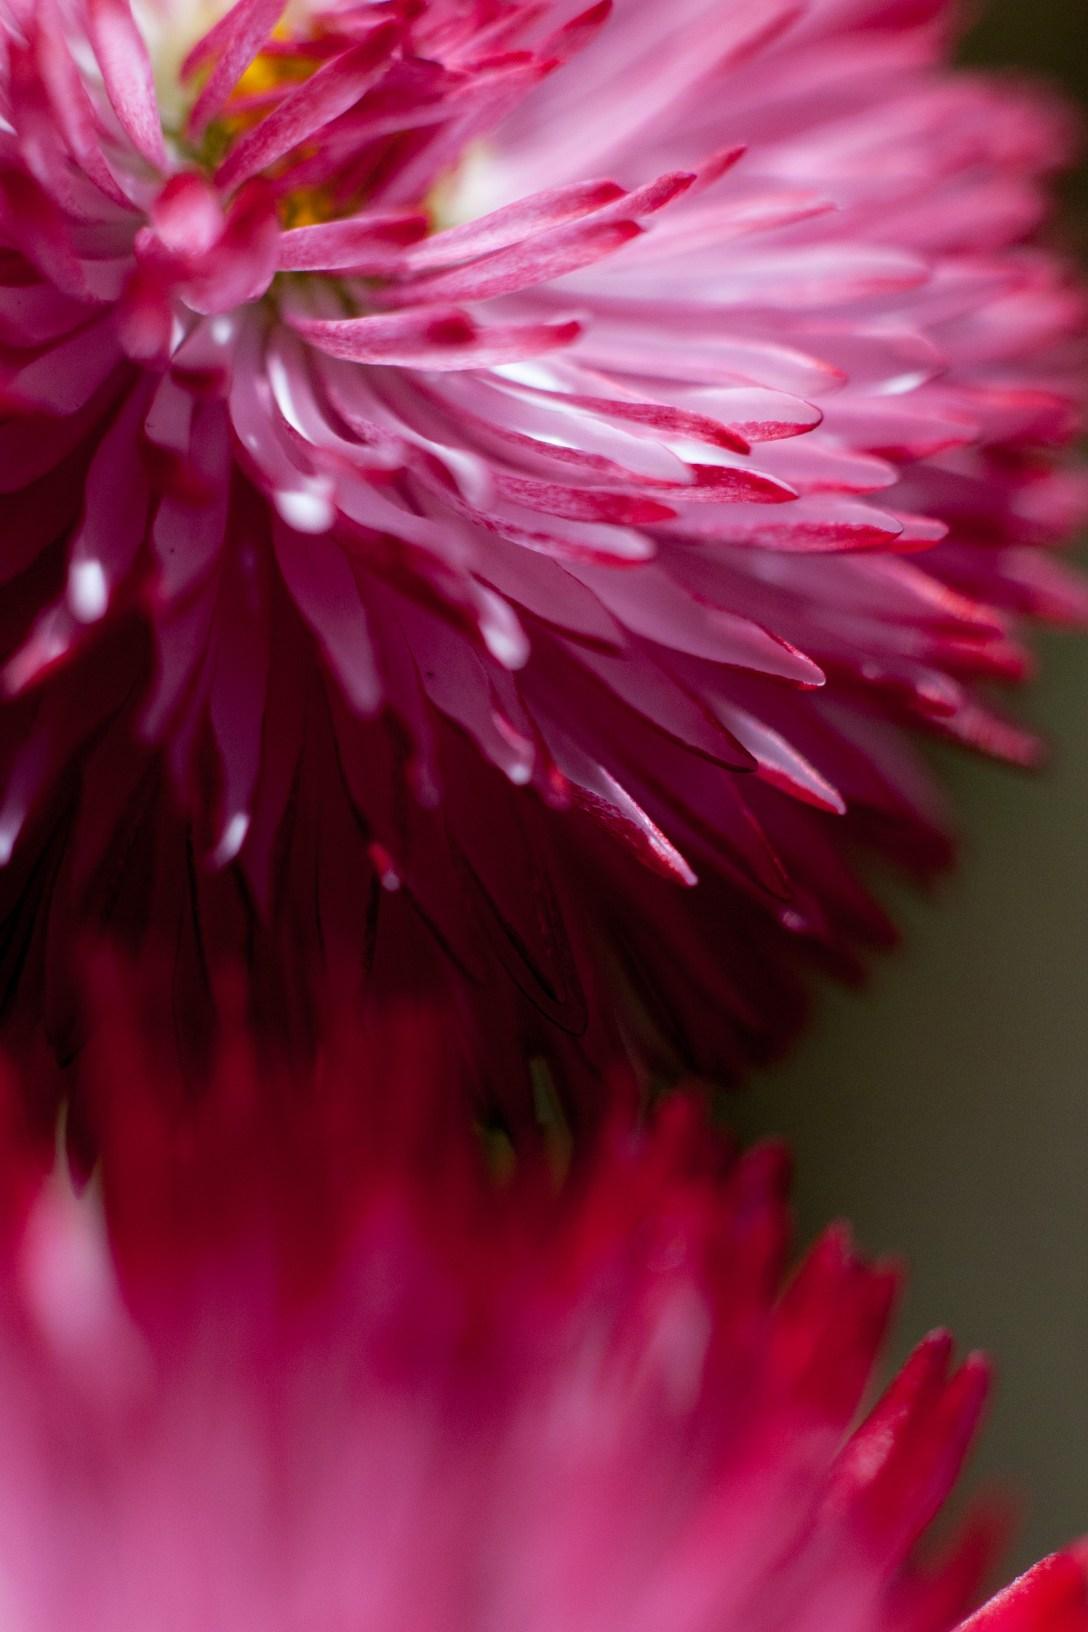 daisy like flower that look like cheerleaders pompoms